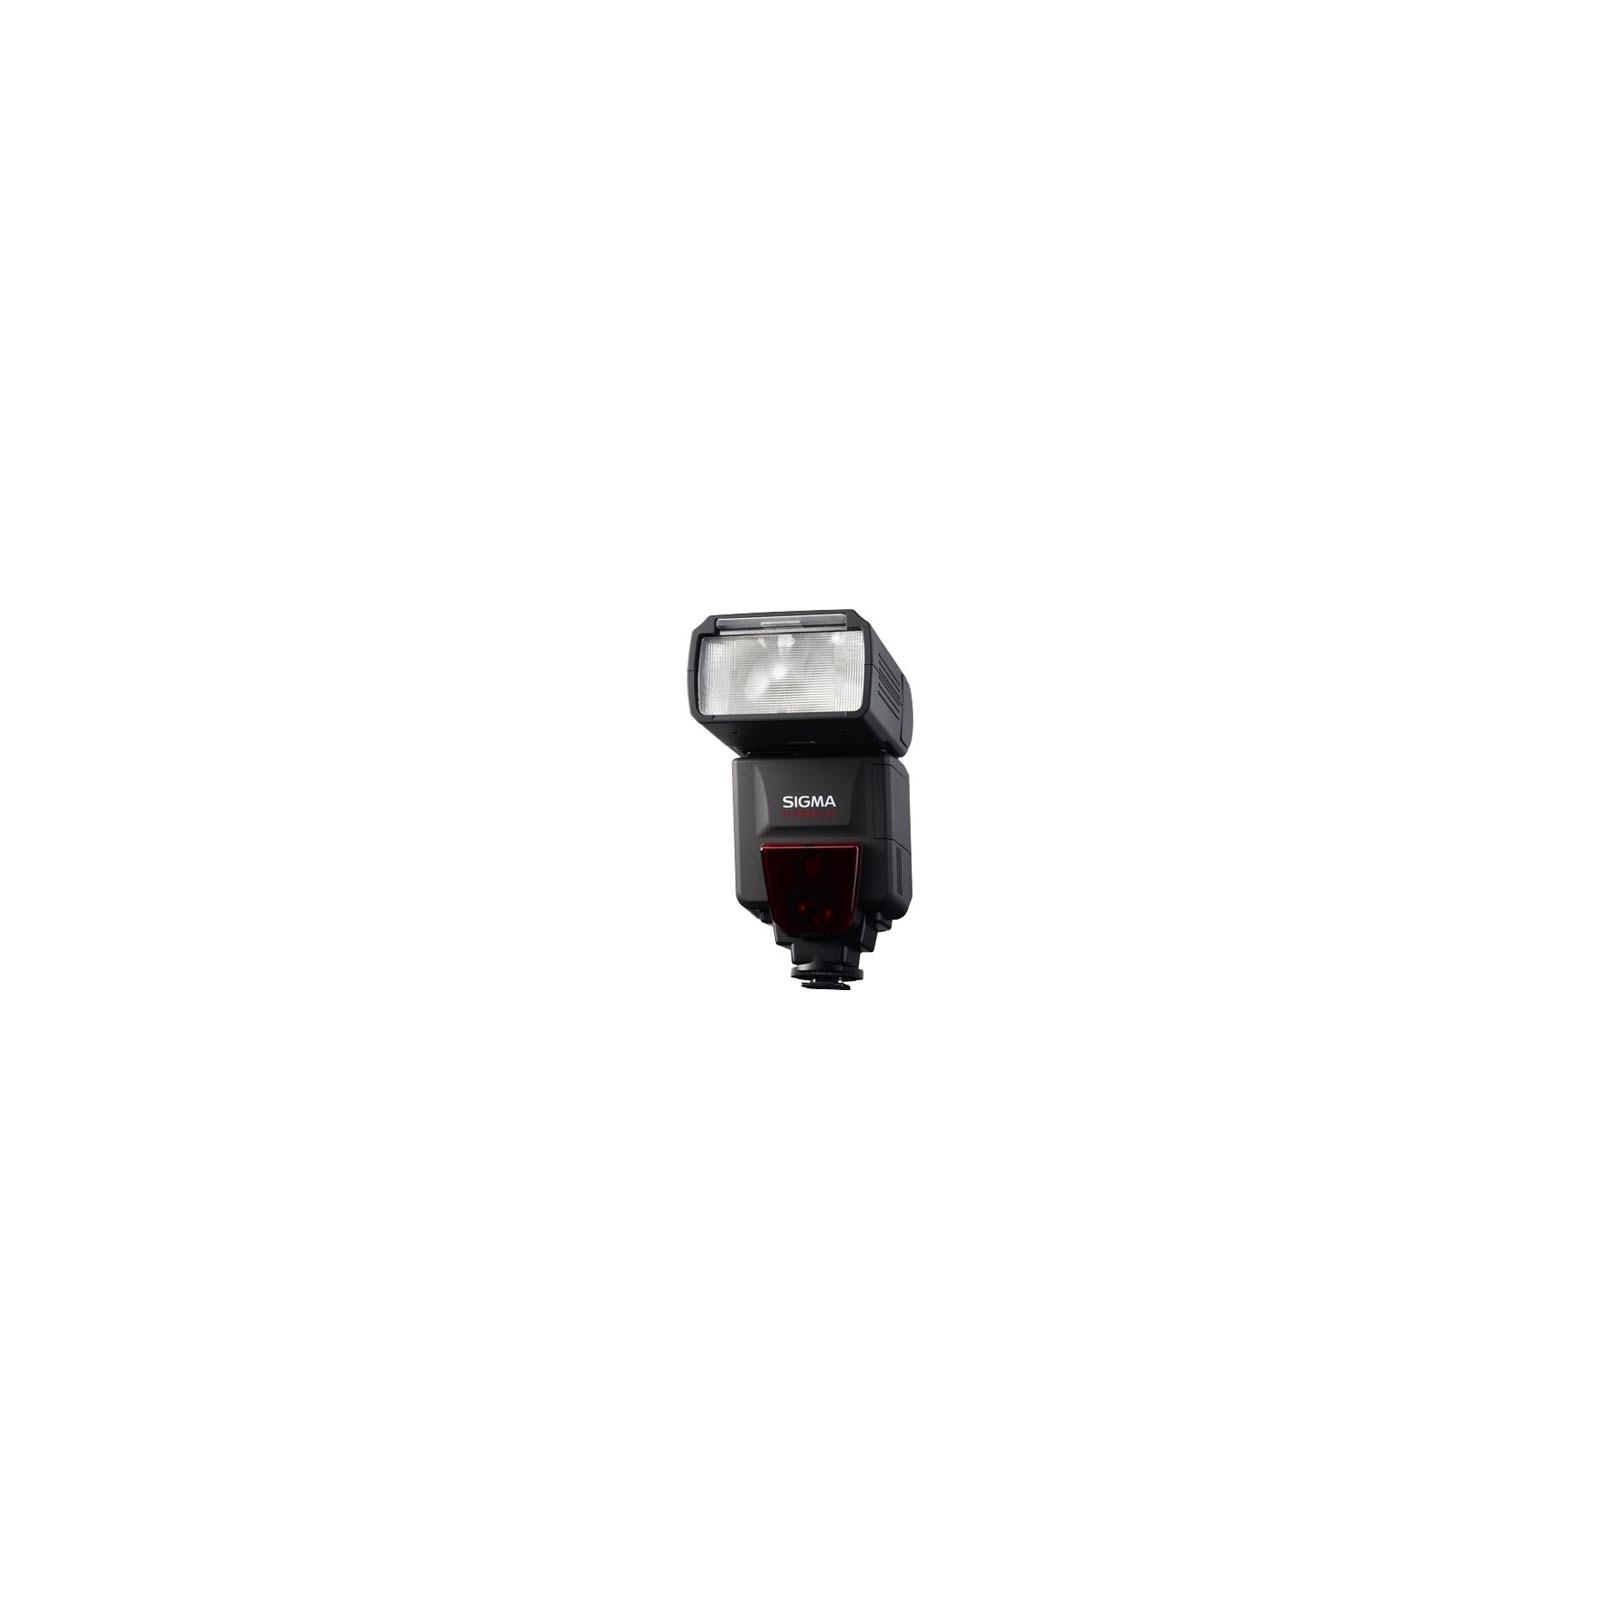 Вспышка EF-610 DG Super for Canon Sigma (F18927)